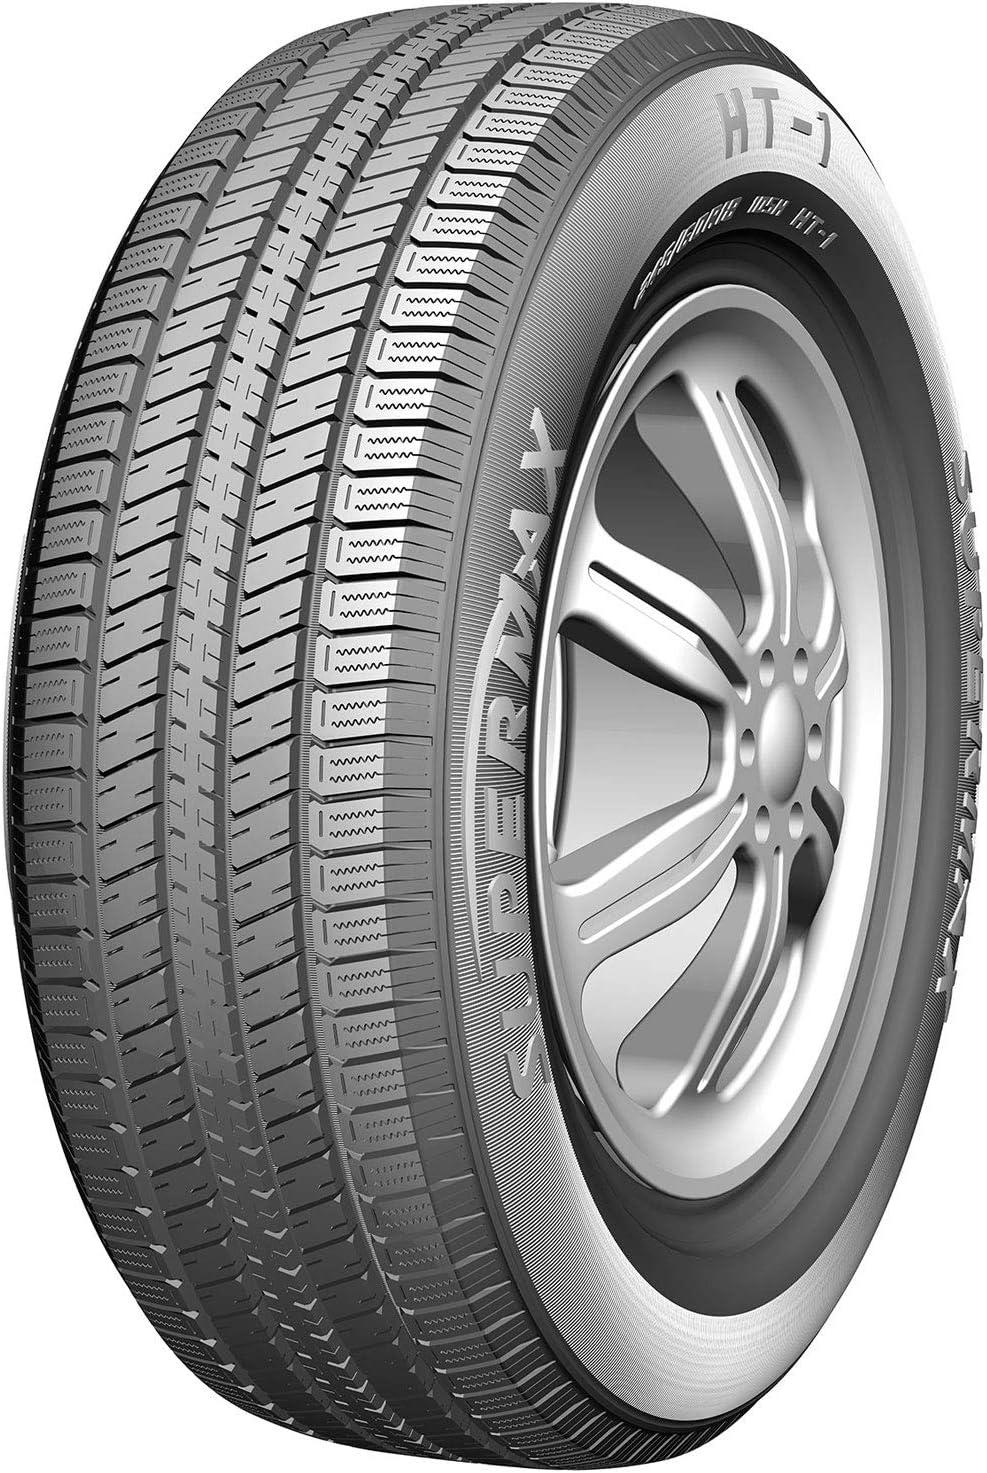 Supermax HT-1 235//55R18 100V All Season Highway Terrain Tire HT